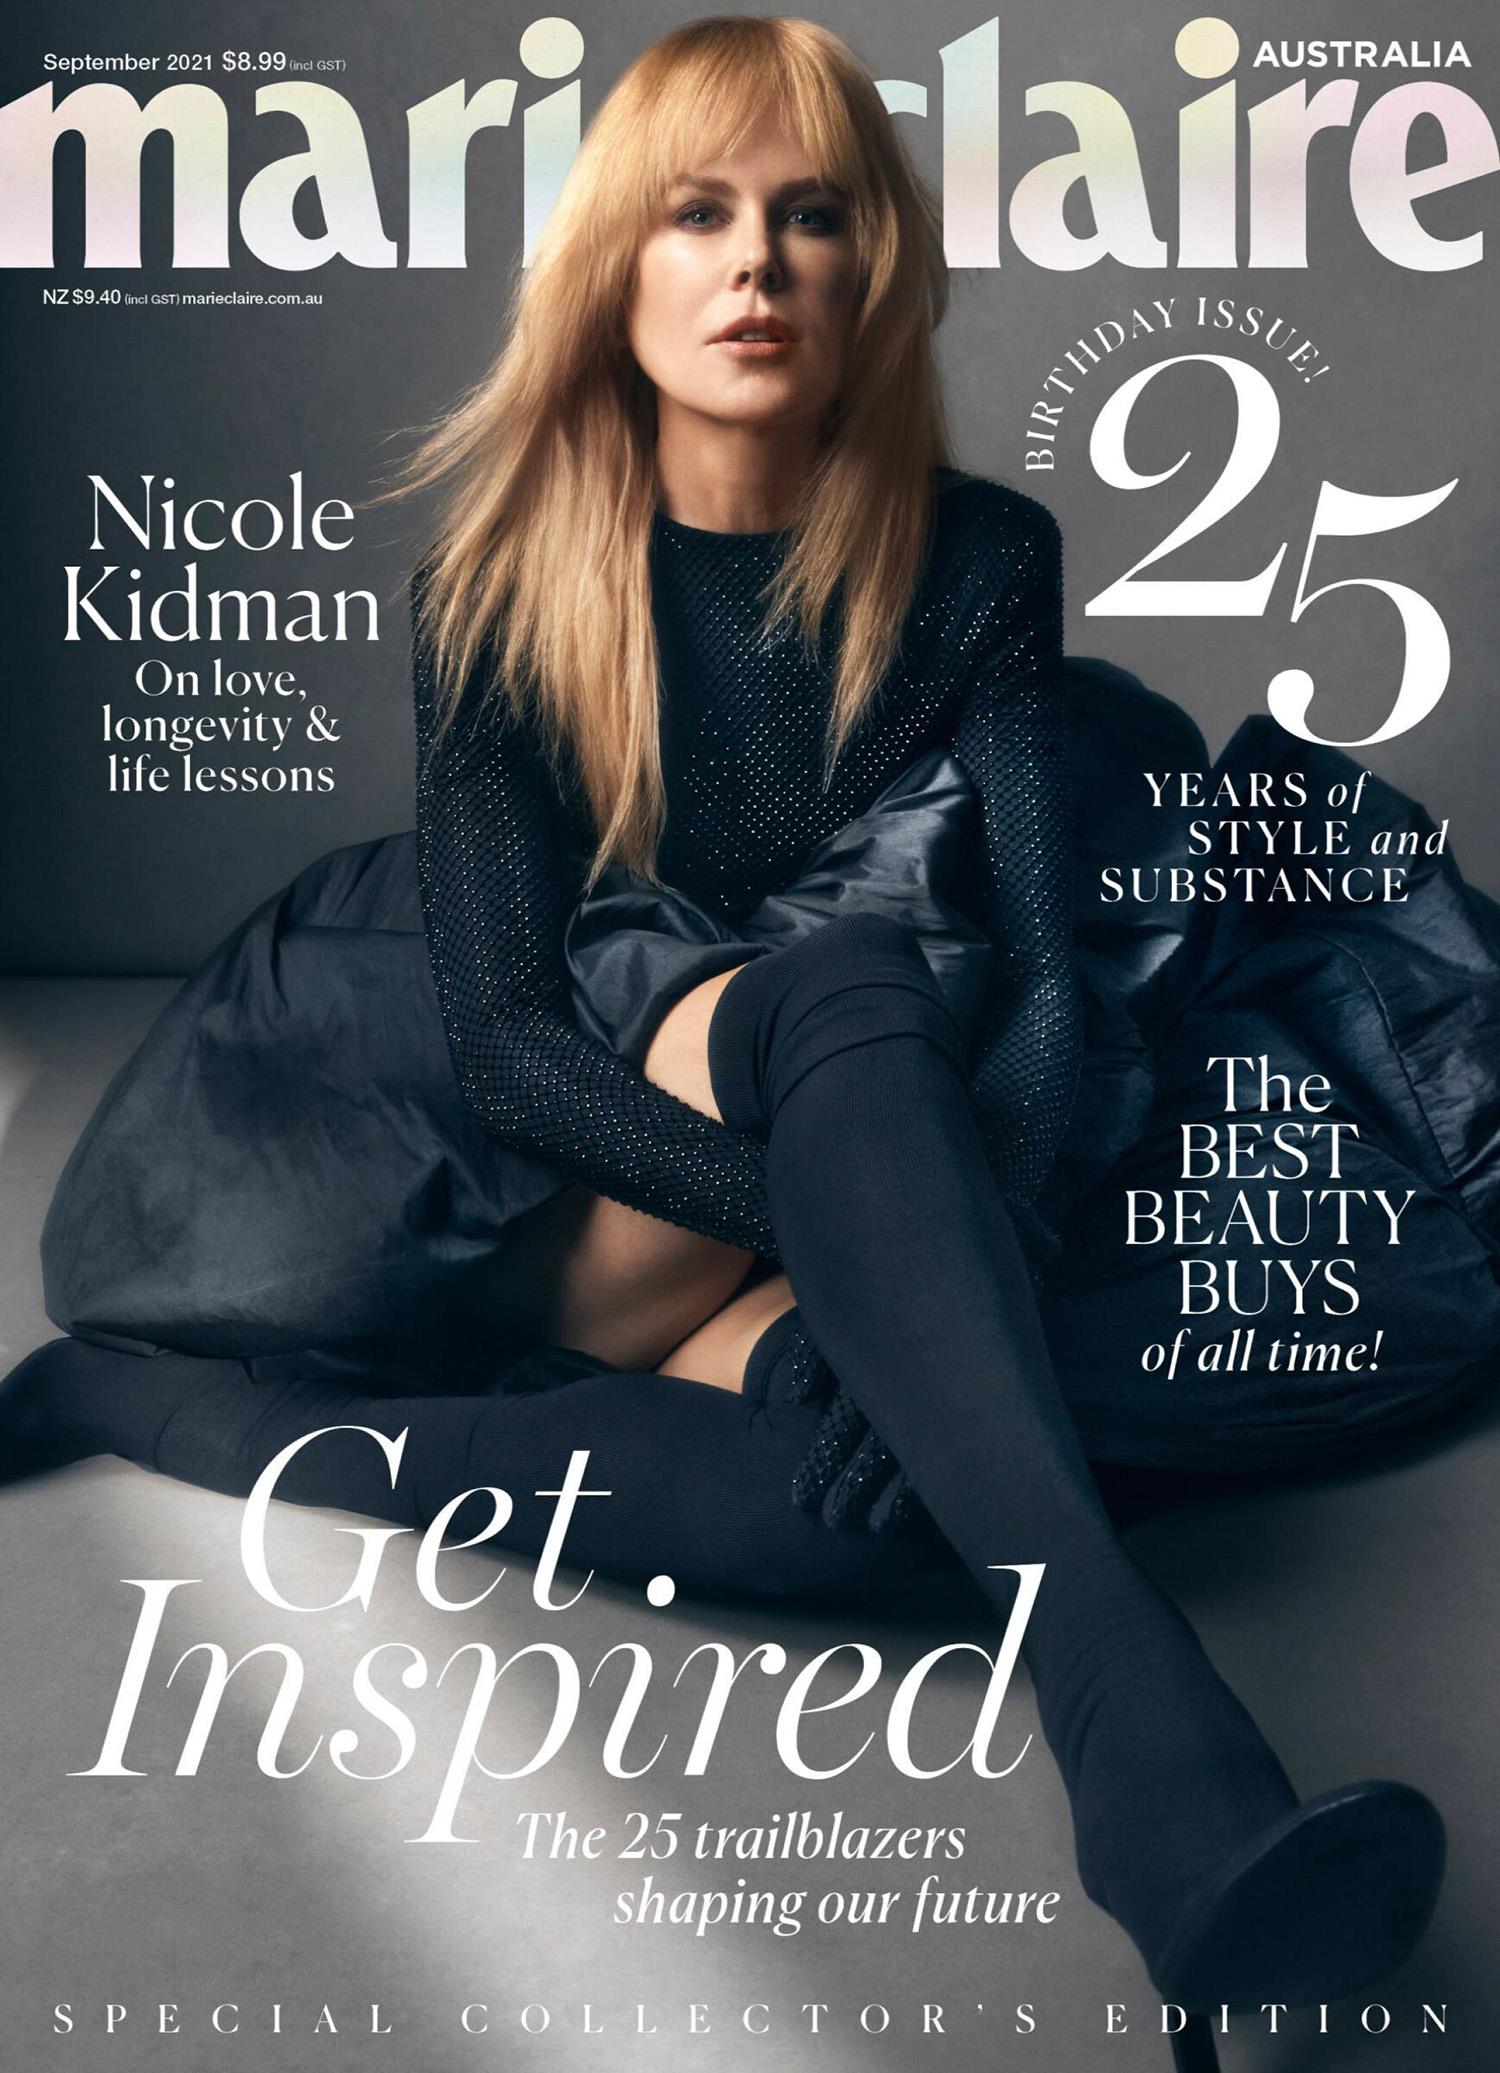 Nicole Kidman covers Marie Claire Australia September 2021 by Darren McDonald